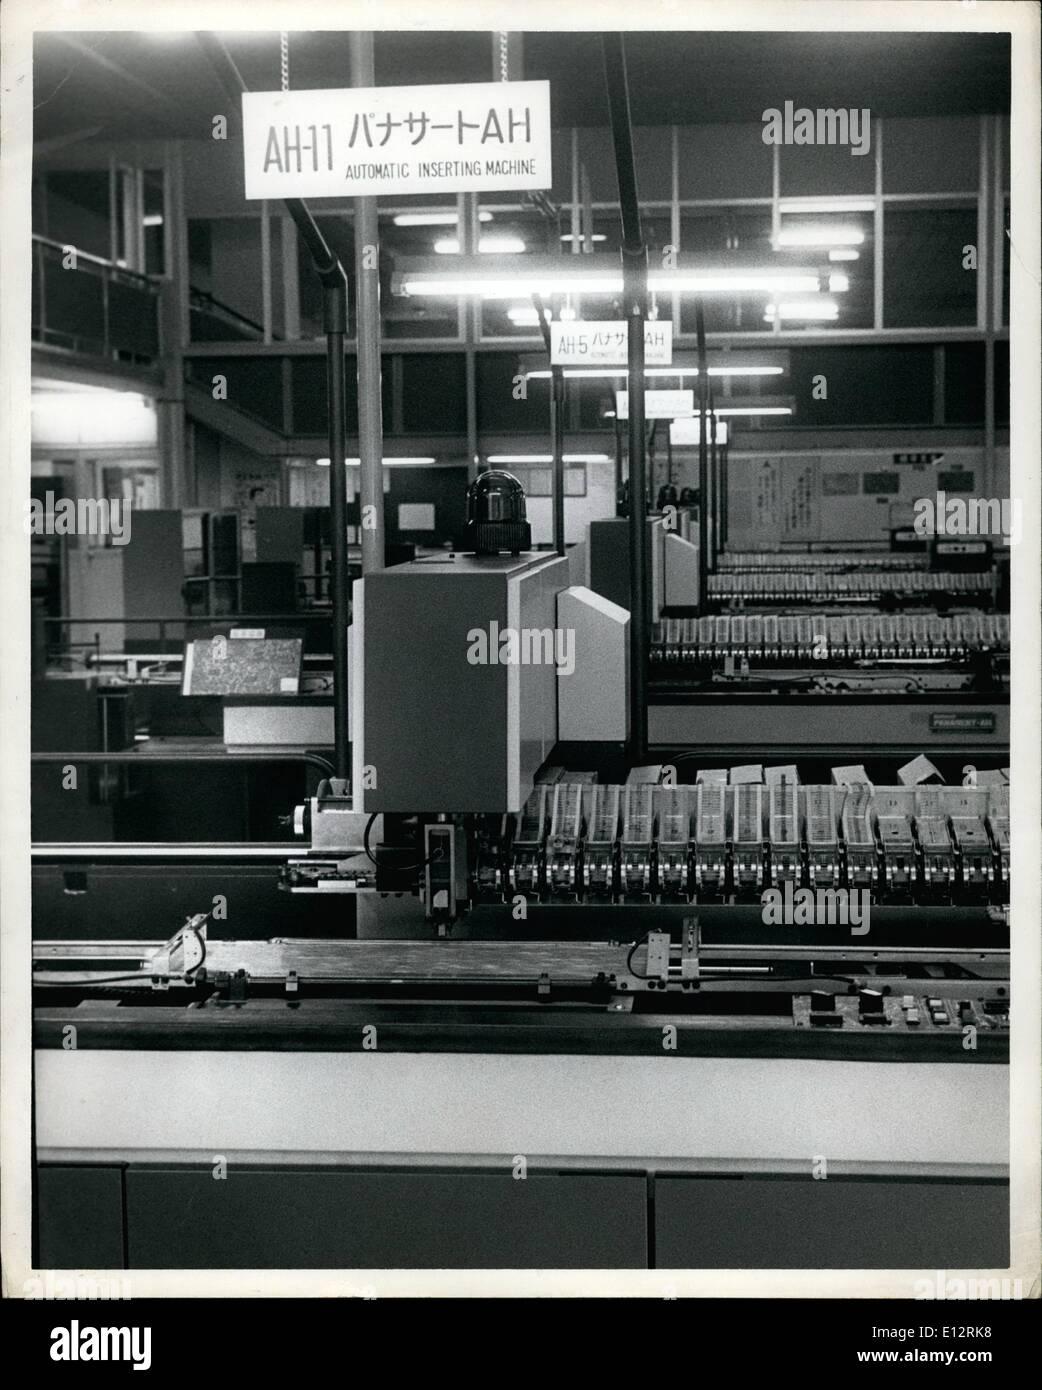 Feb. 25, 2012 - Making printed circuits. - Stock Image